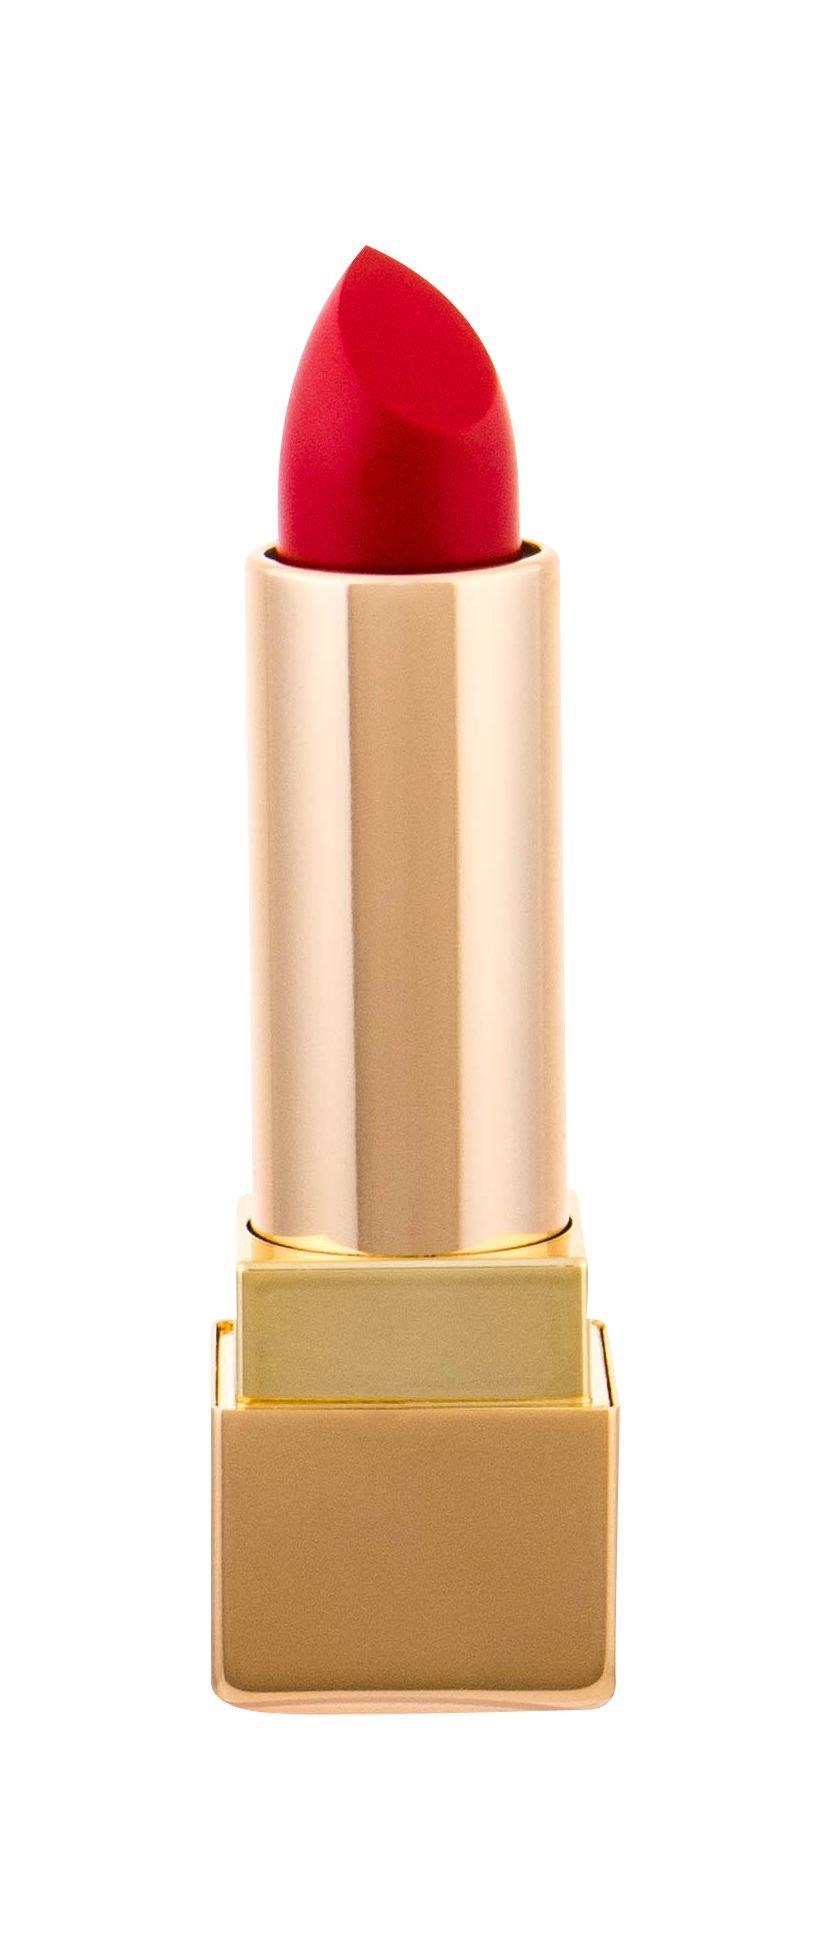 Yves Saint Laurent Rouge Pur Couture Lipstick 3,8ml 203 Rouge Rock